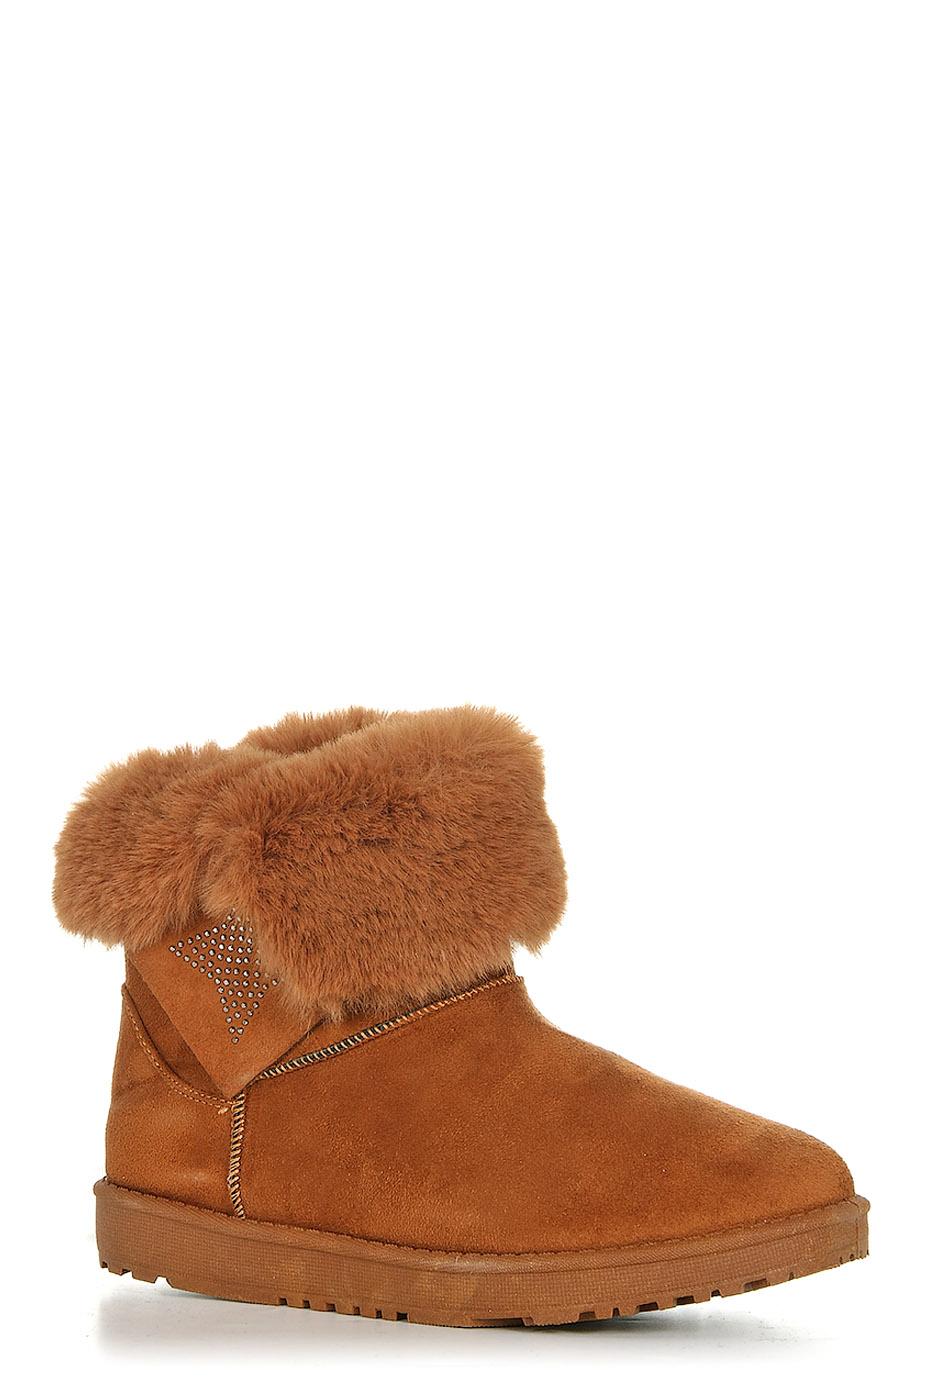 Ботинки TOPLAND2352-PB76147K/CAMEL